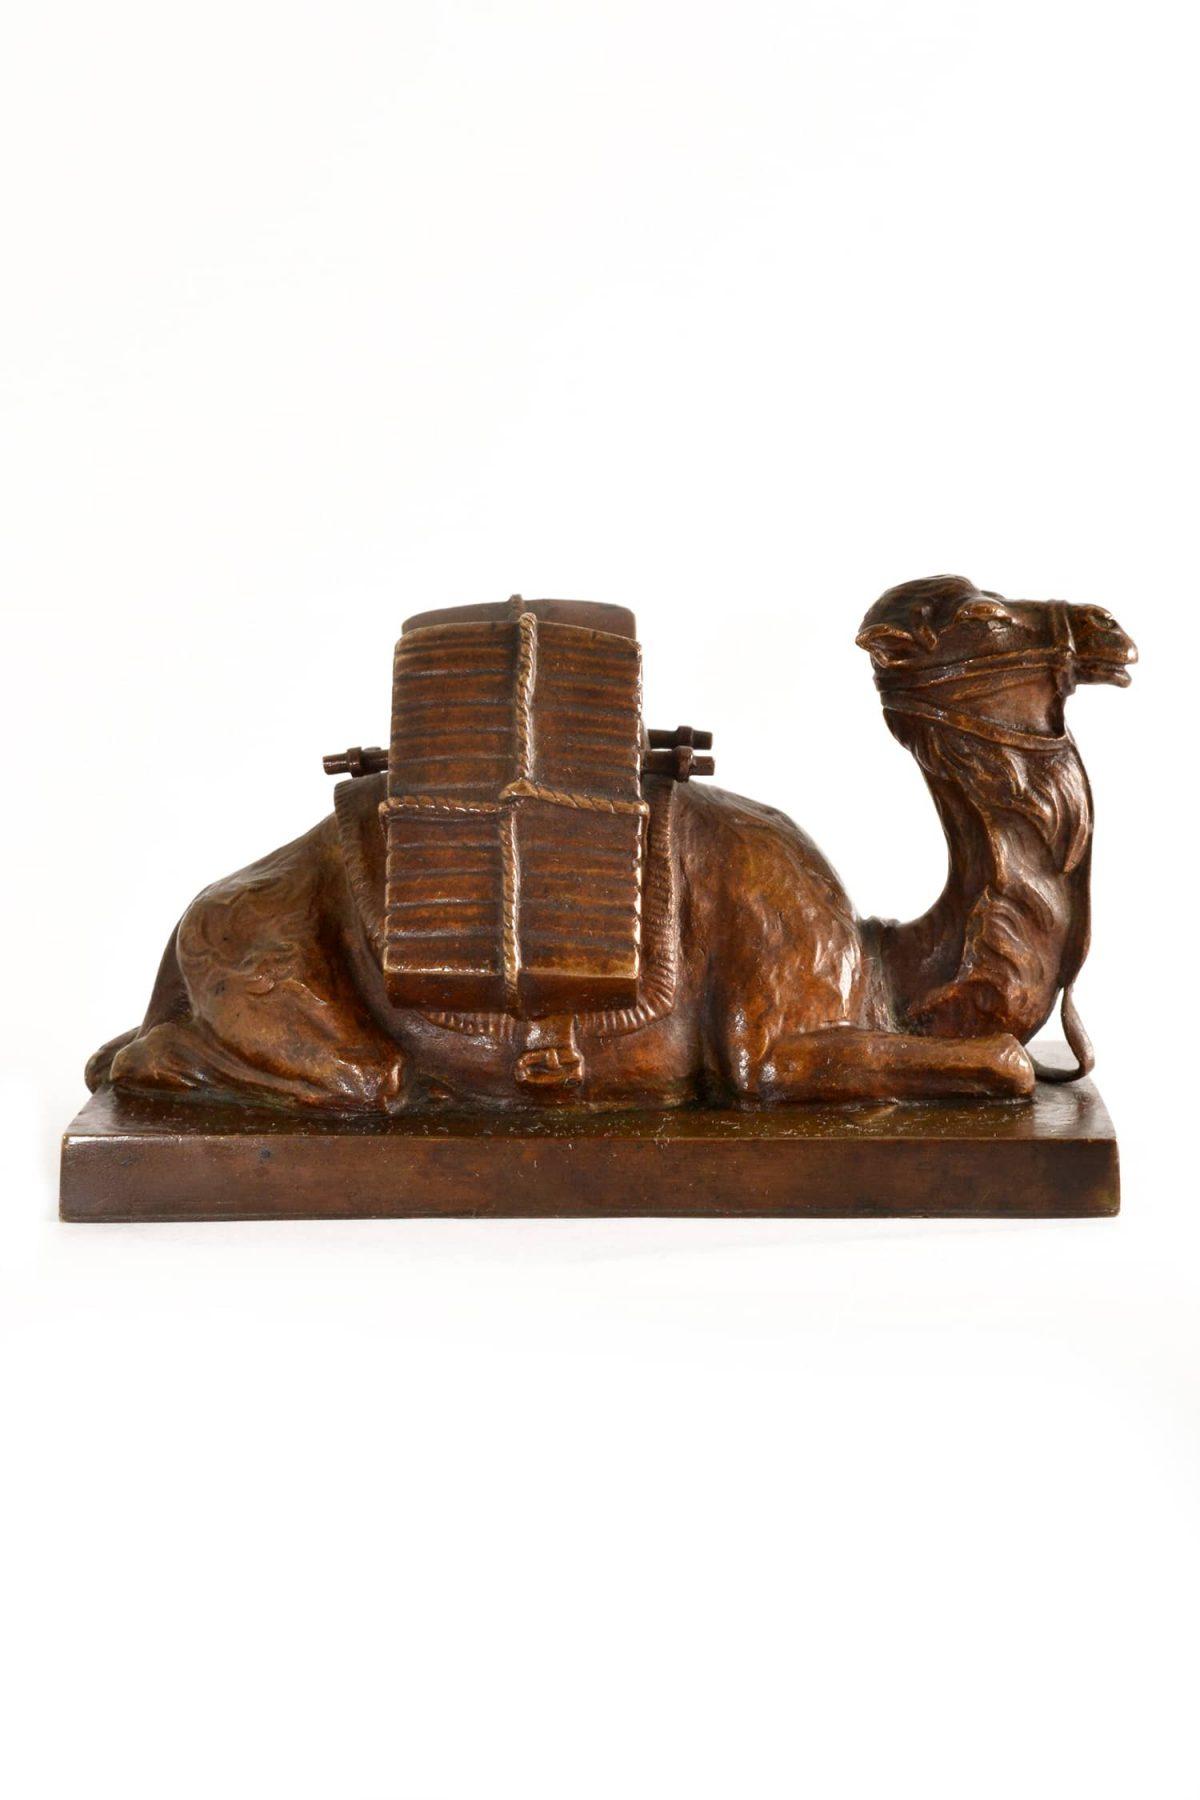 Friedrich Gornik (Austrian, 1877-1943) Bronze Sculpture. Seated Camel. 1923